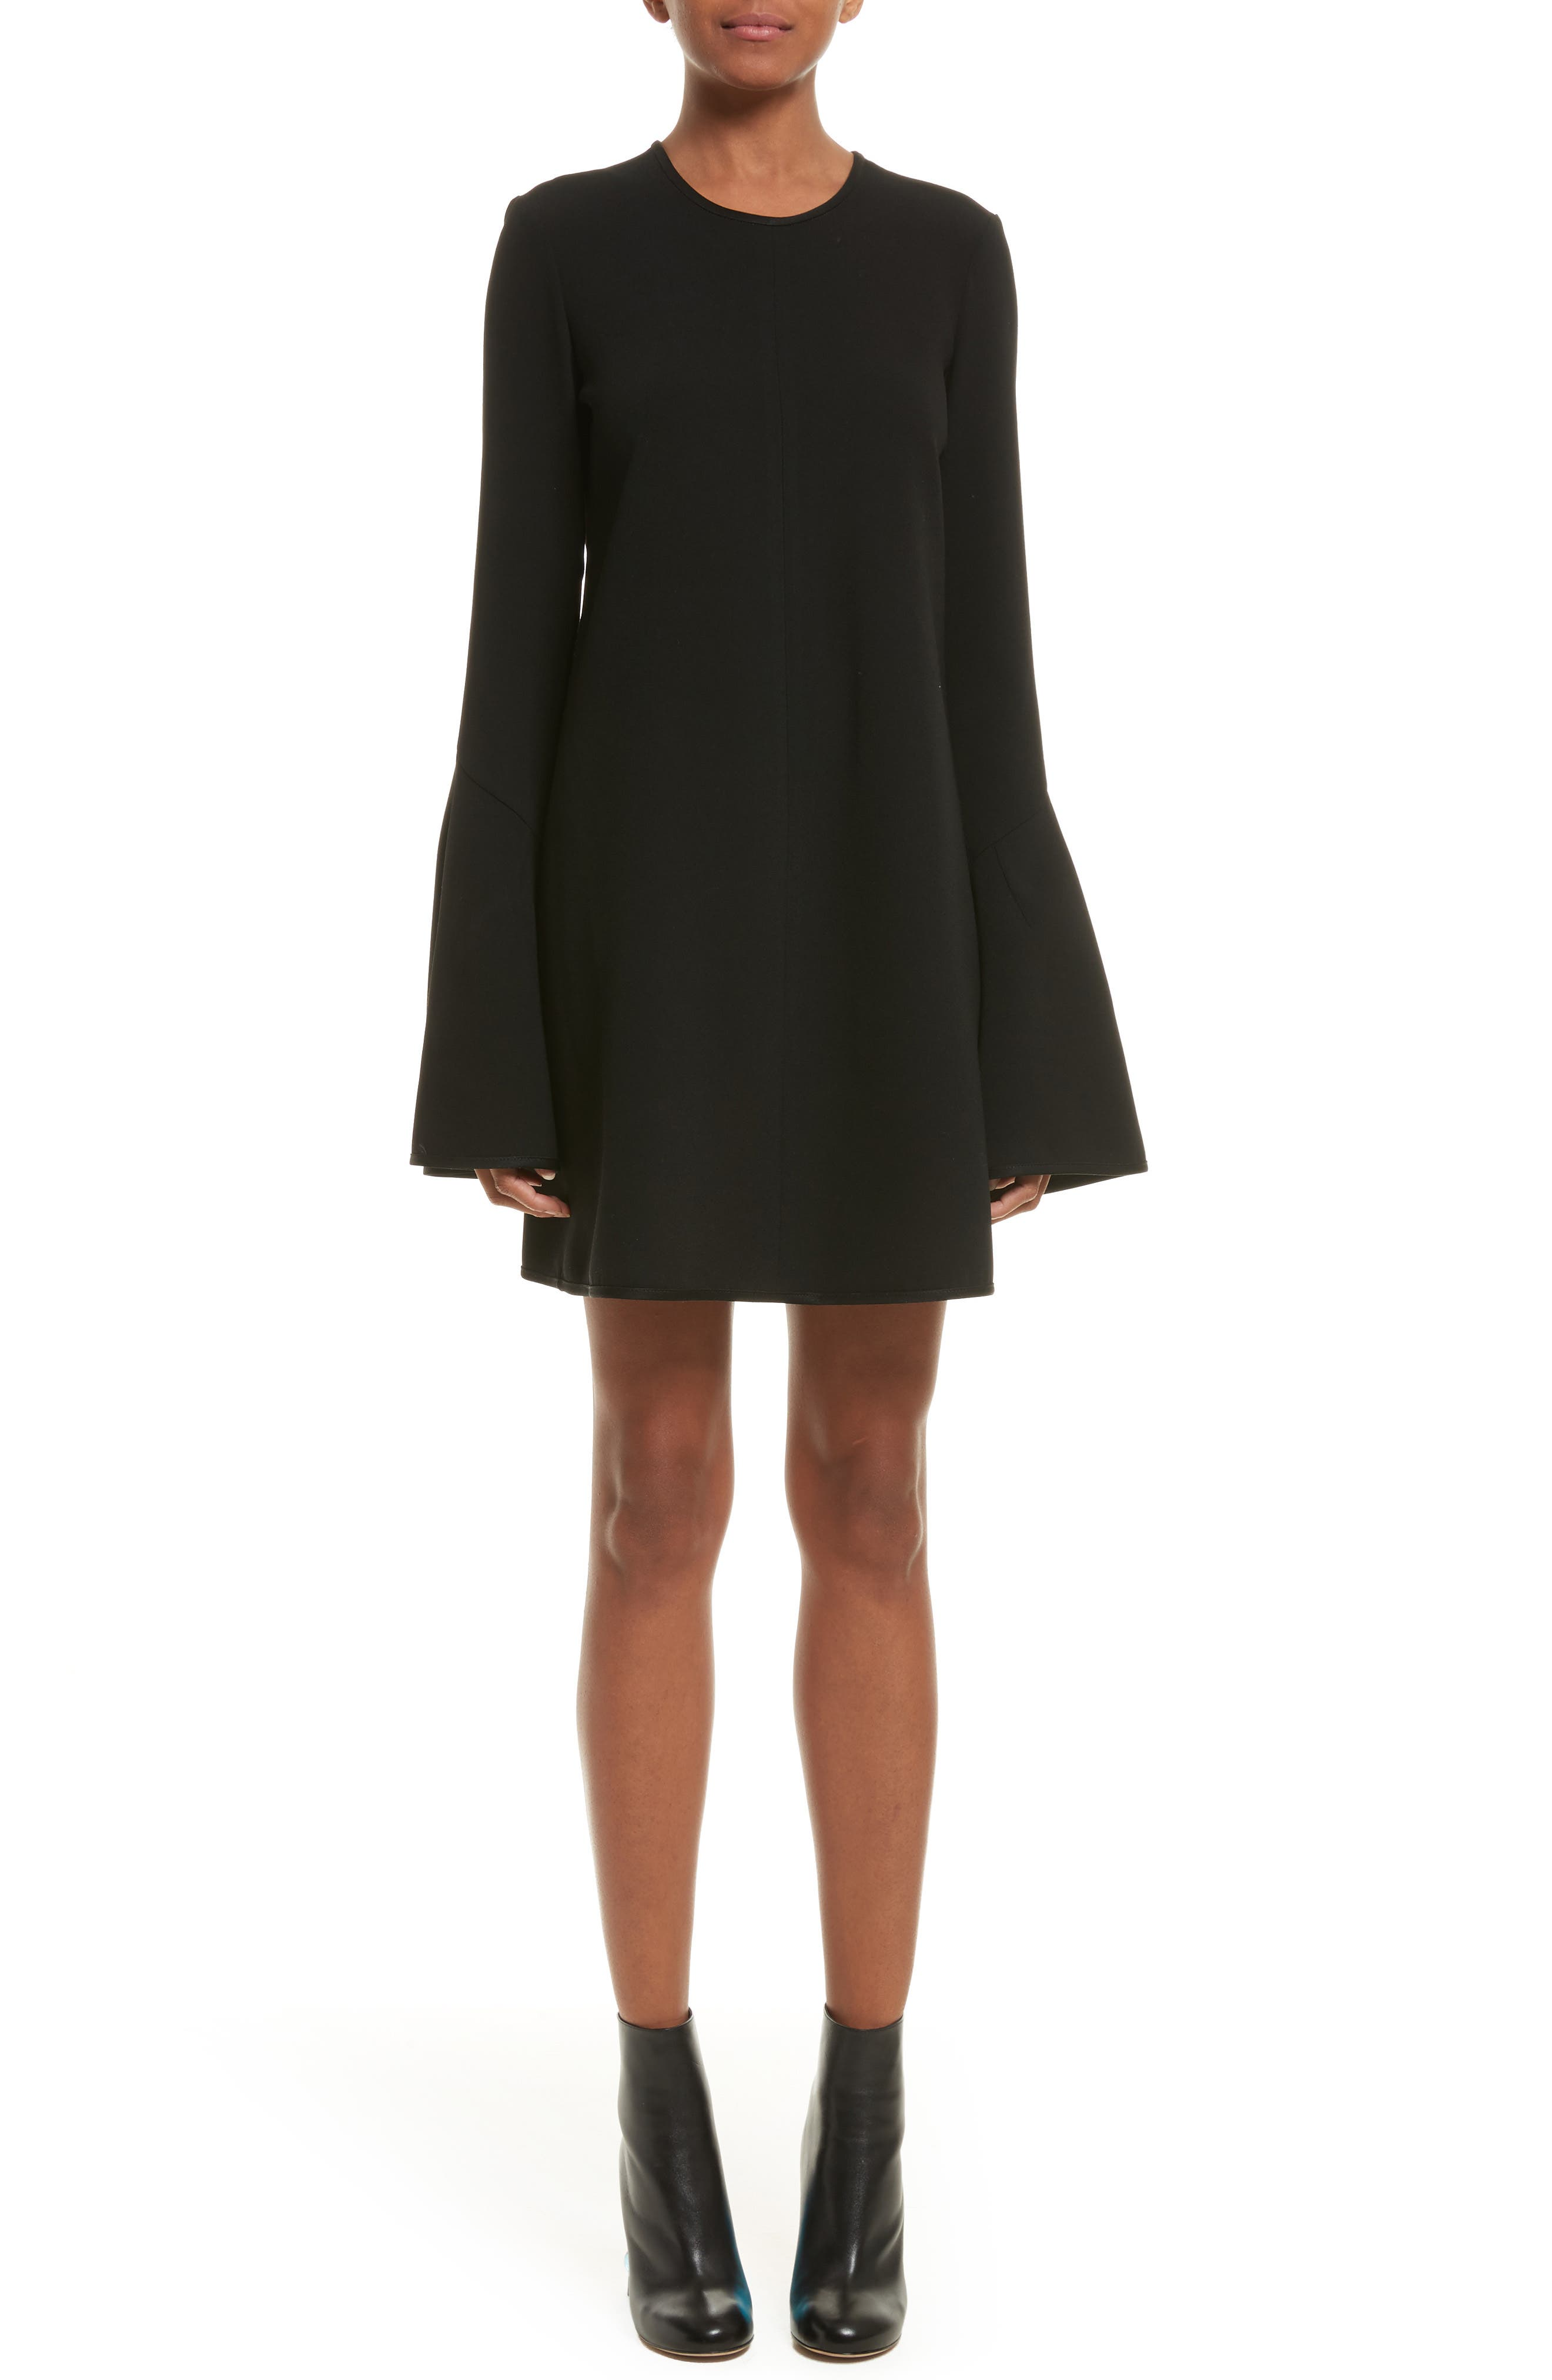 Alternate Image 1 Selected - ELLERY Preacher Satin Crepe Dress